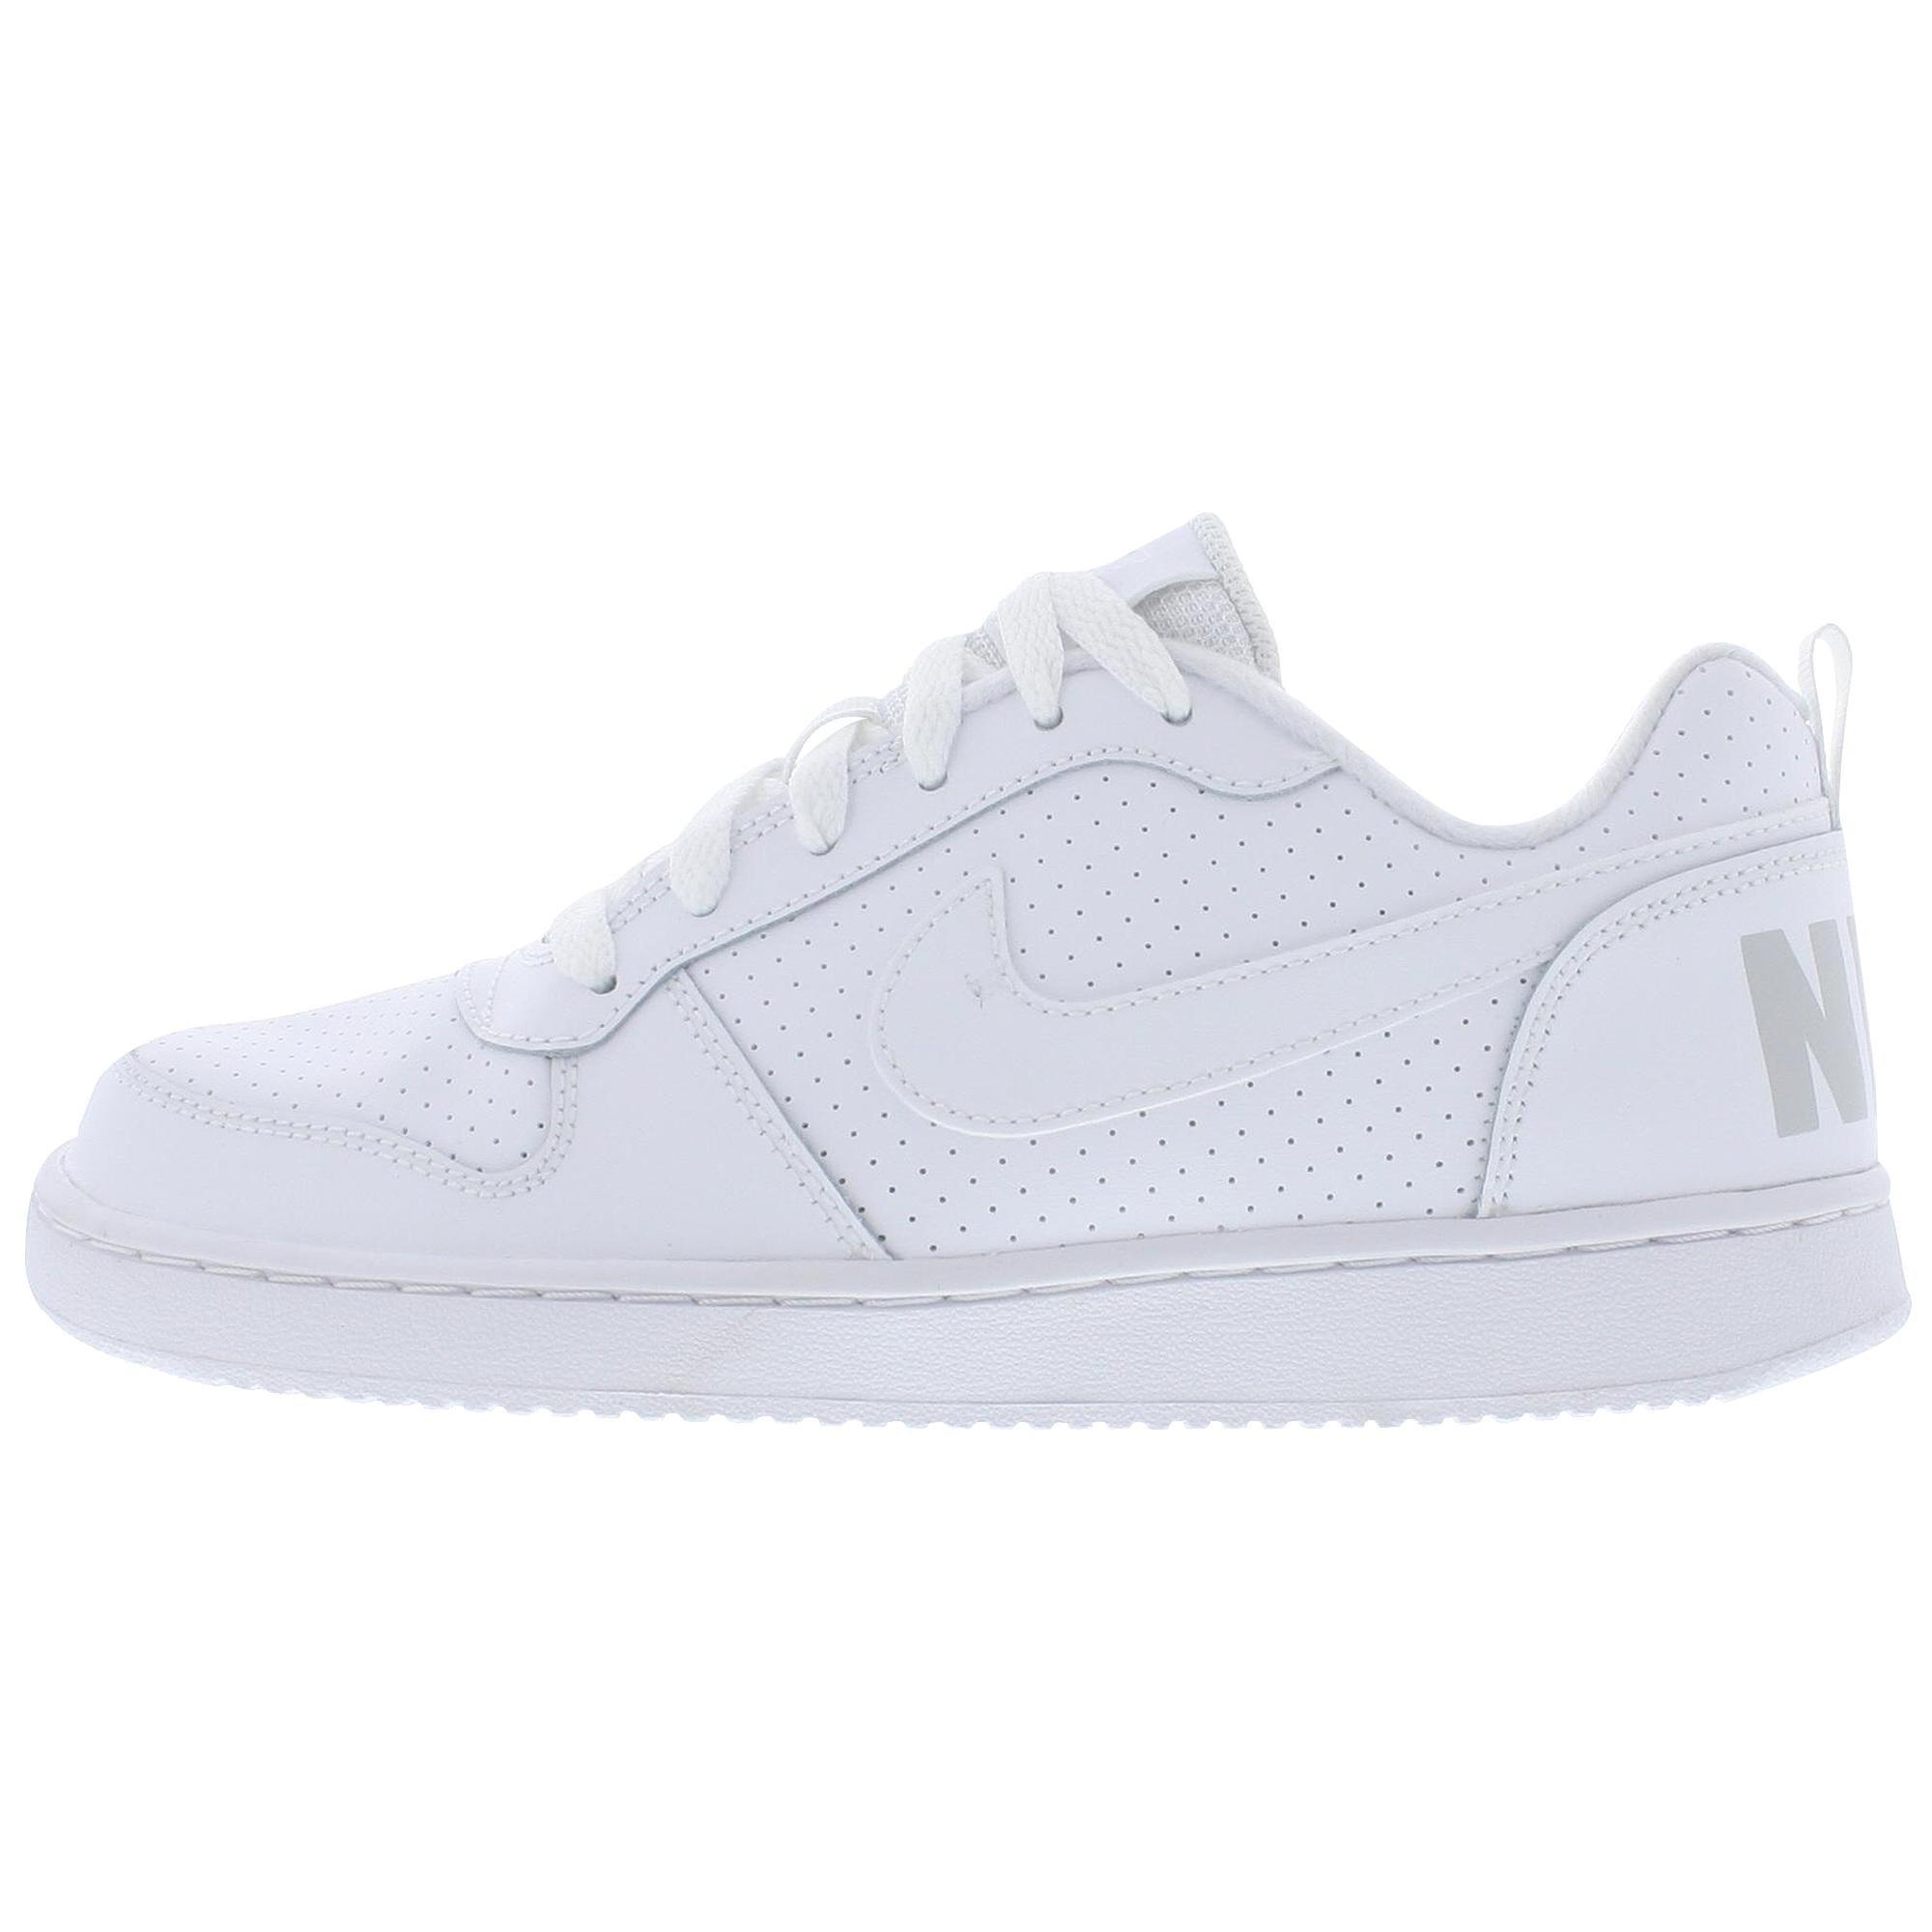 Nike Court Borough Low (GS) Spor Ayakkabı 839985-100 - Barcin.com